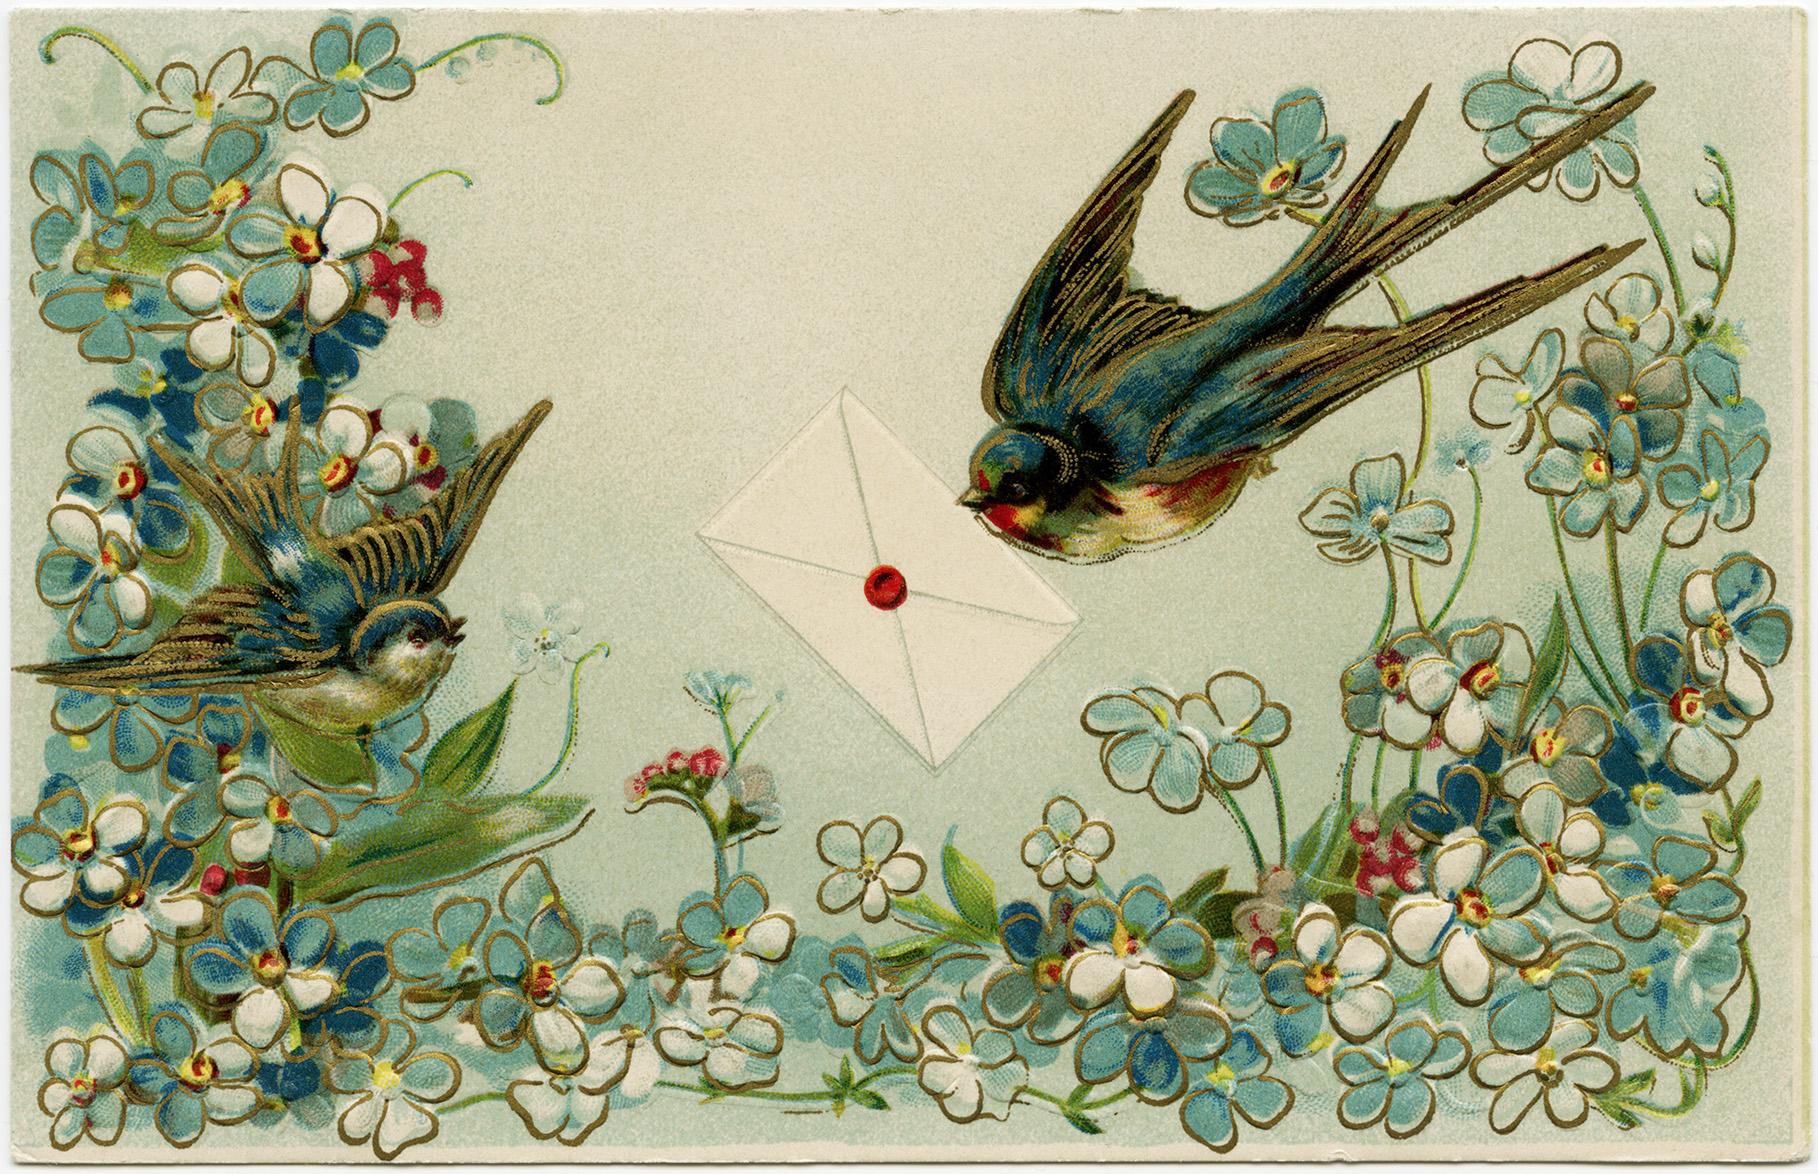 Любимый картинках, открытки 8 марта птицы